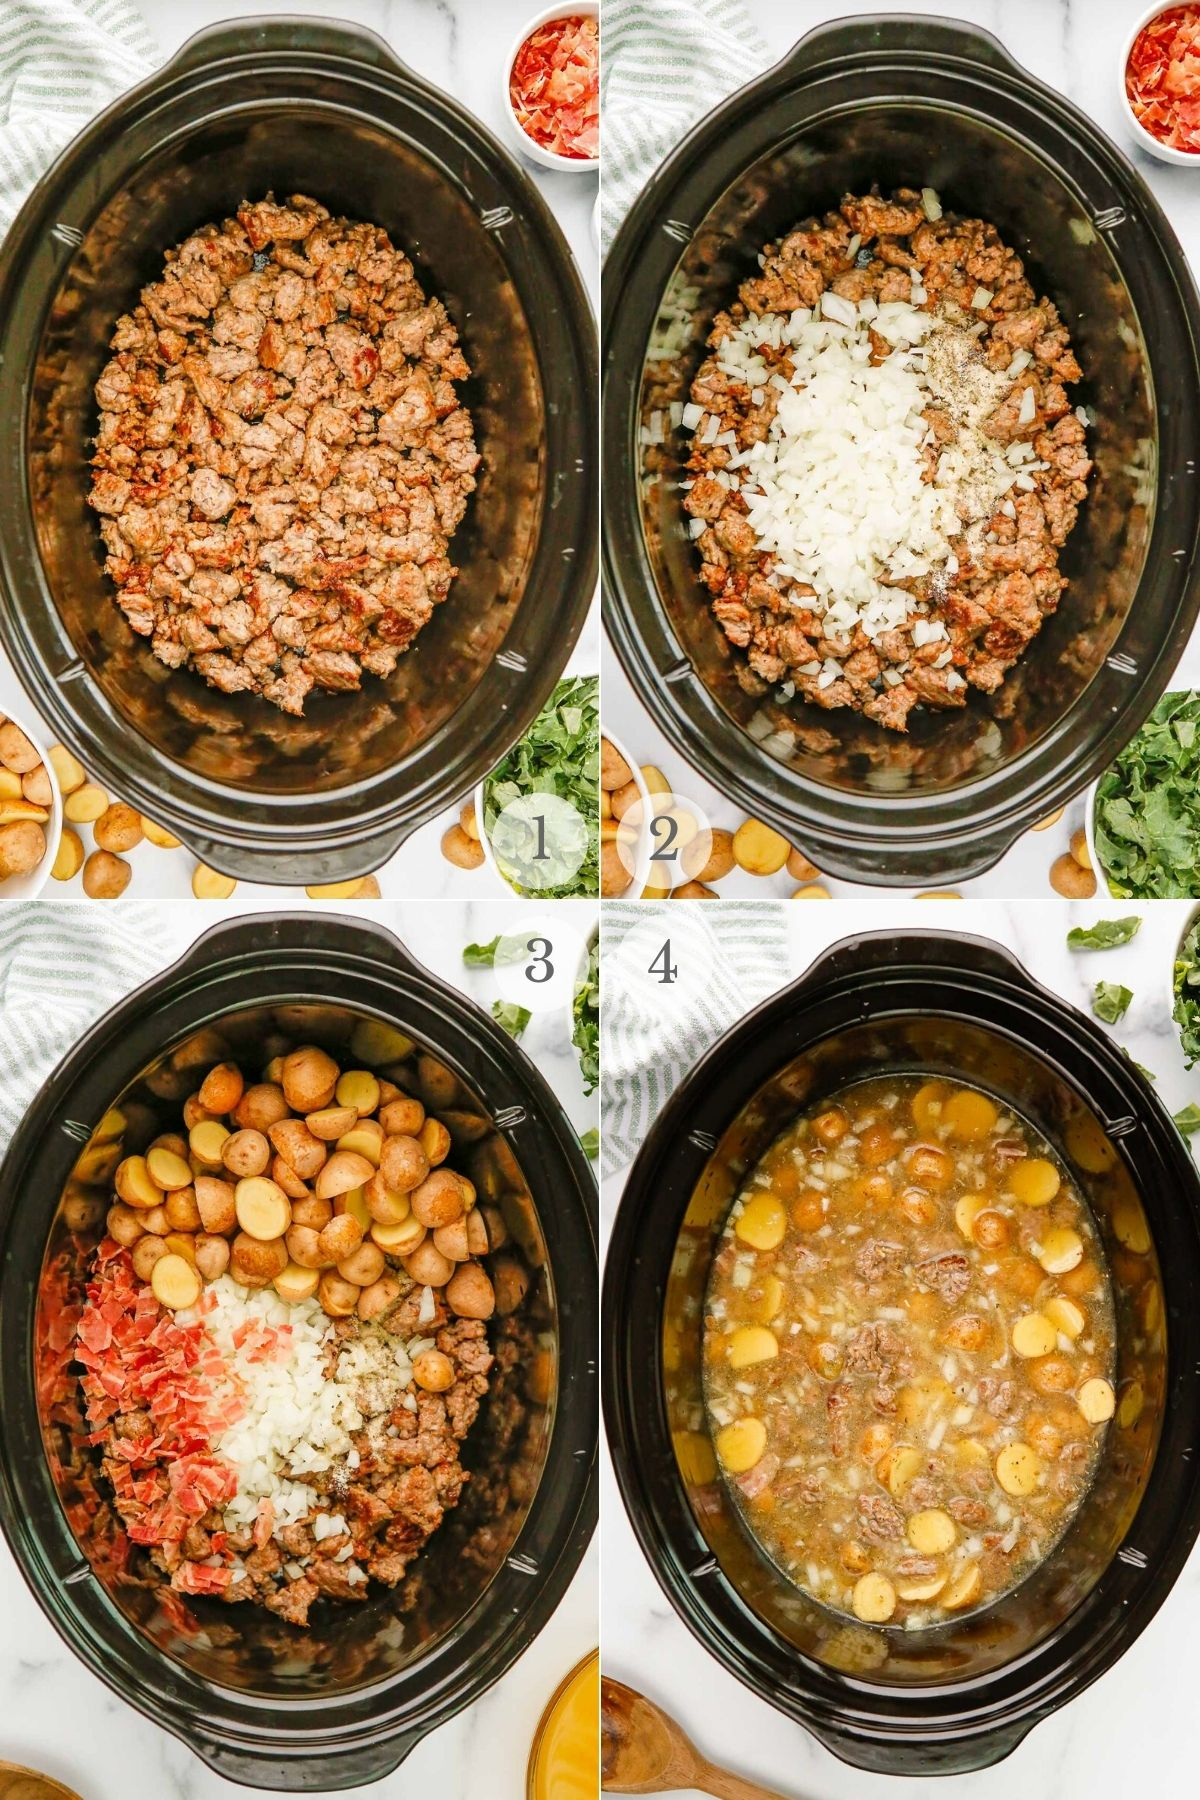 Zuppa Toscana recipe steps 1-4